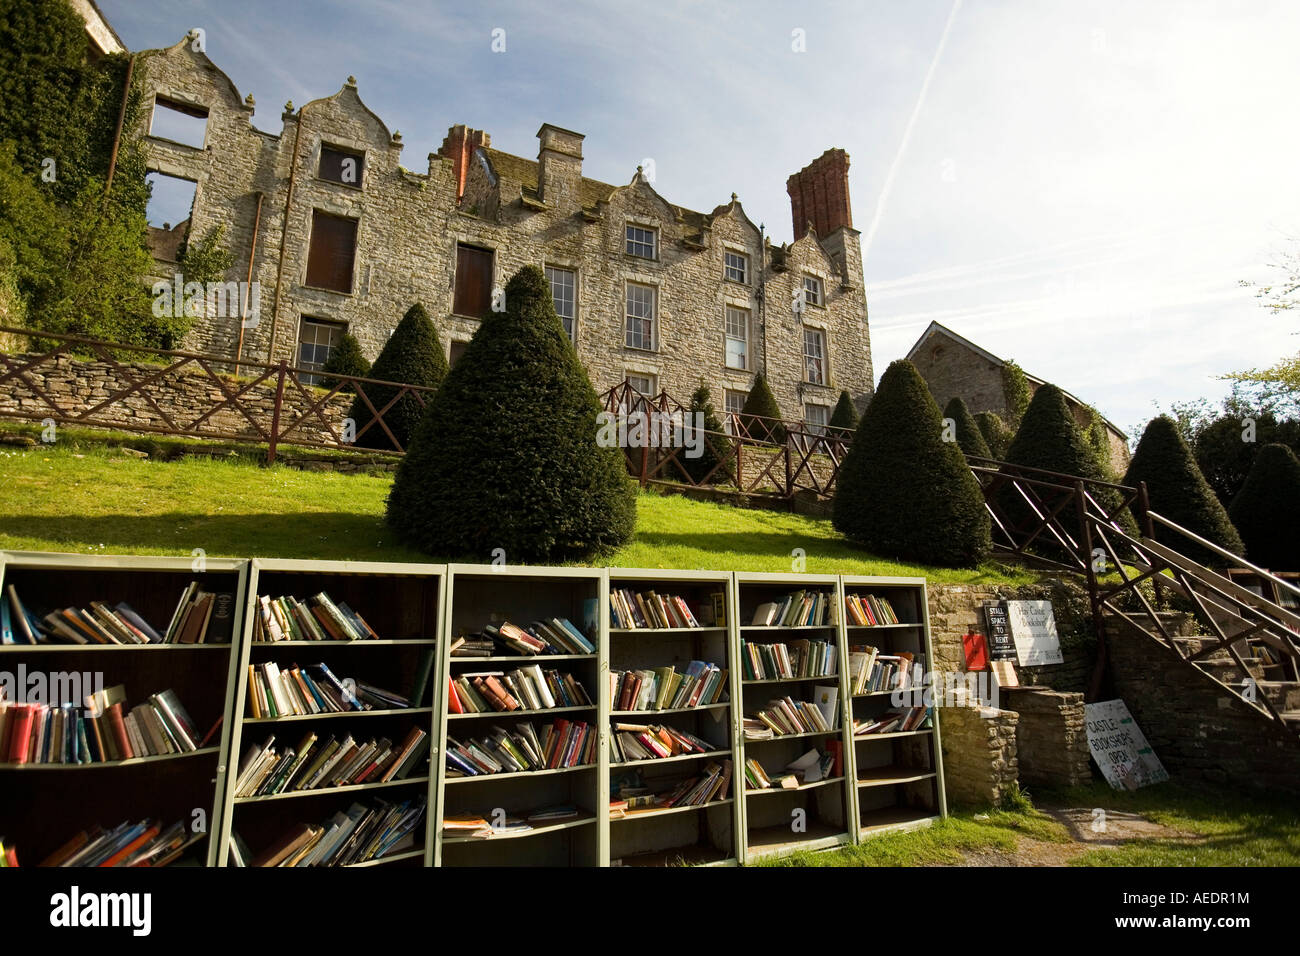 UK Wales Powys Hay on Wye Hay Castle outdoor bookshop - Stock Image